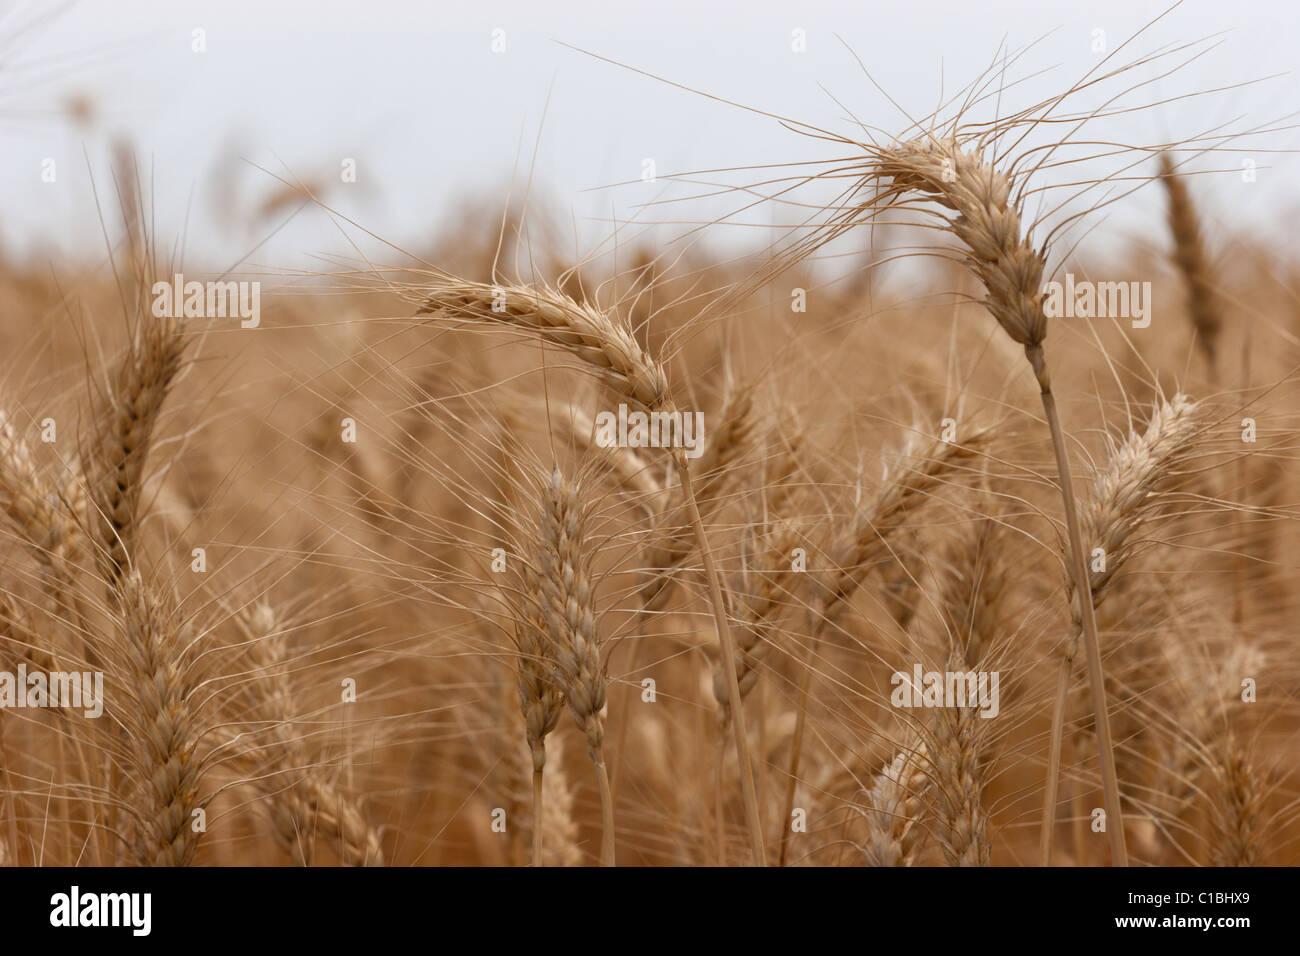 barley wheat cereal grain harvest golden food field farming crop - Stock Image